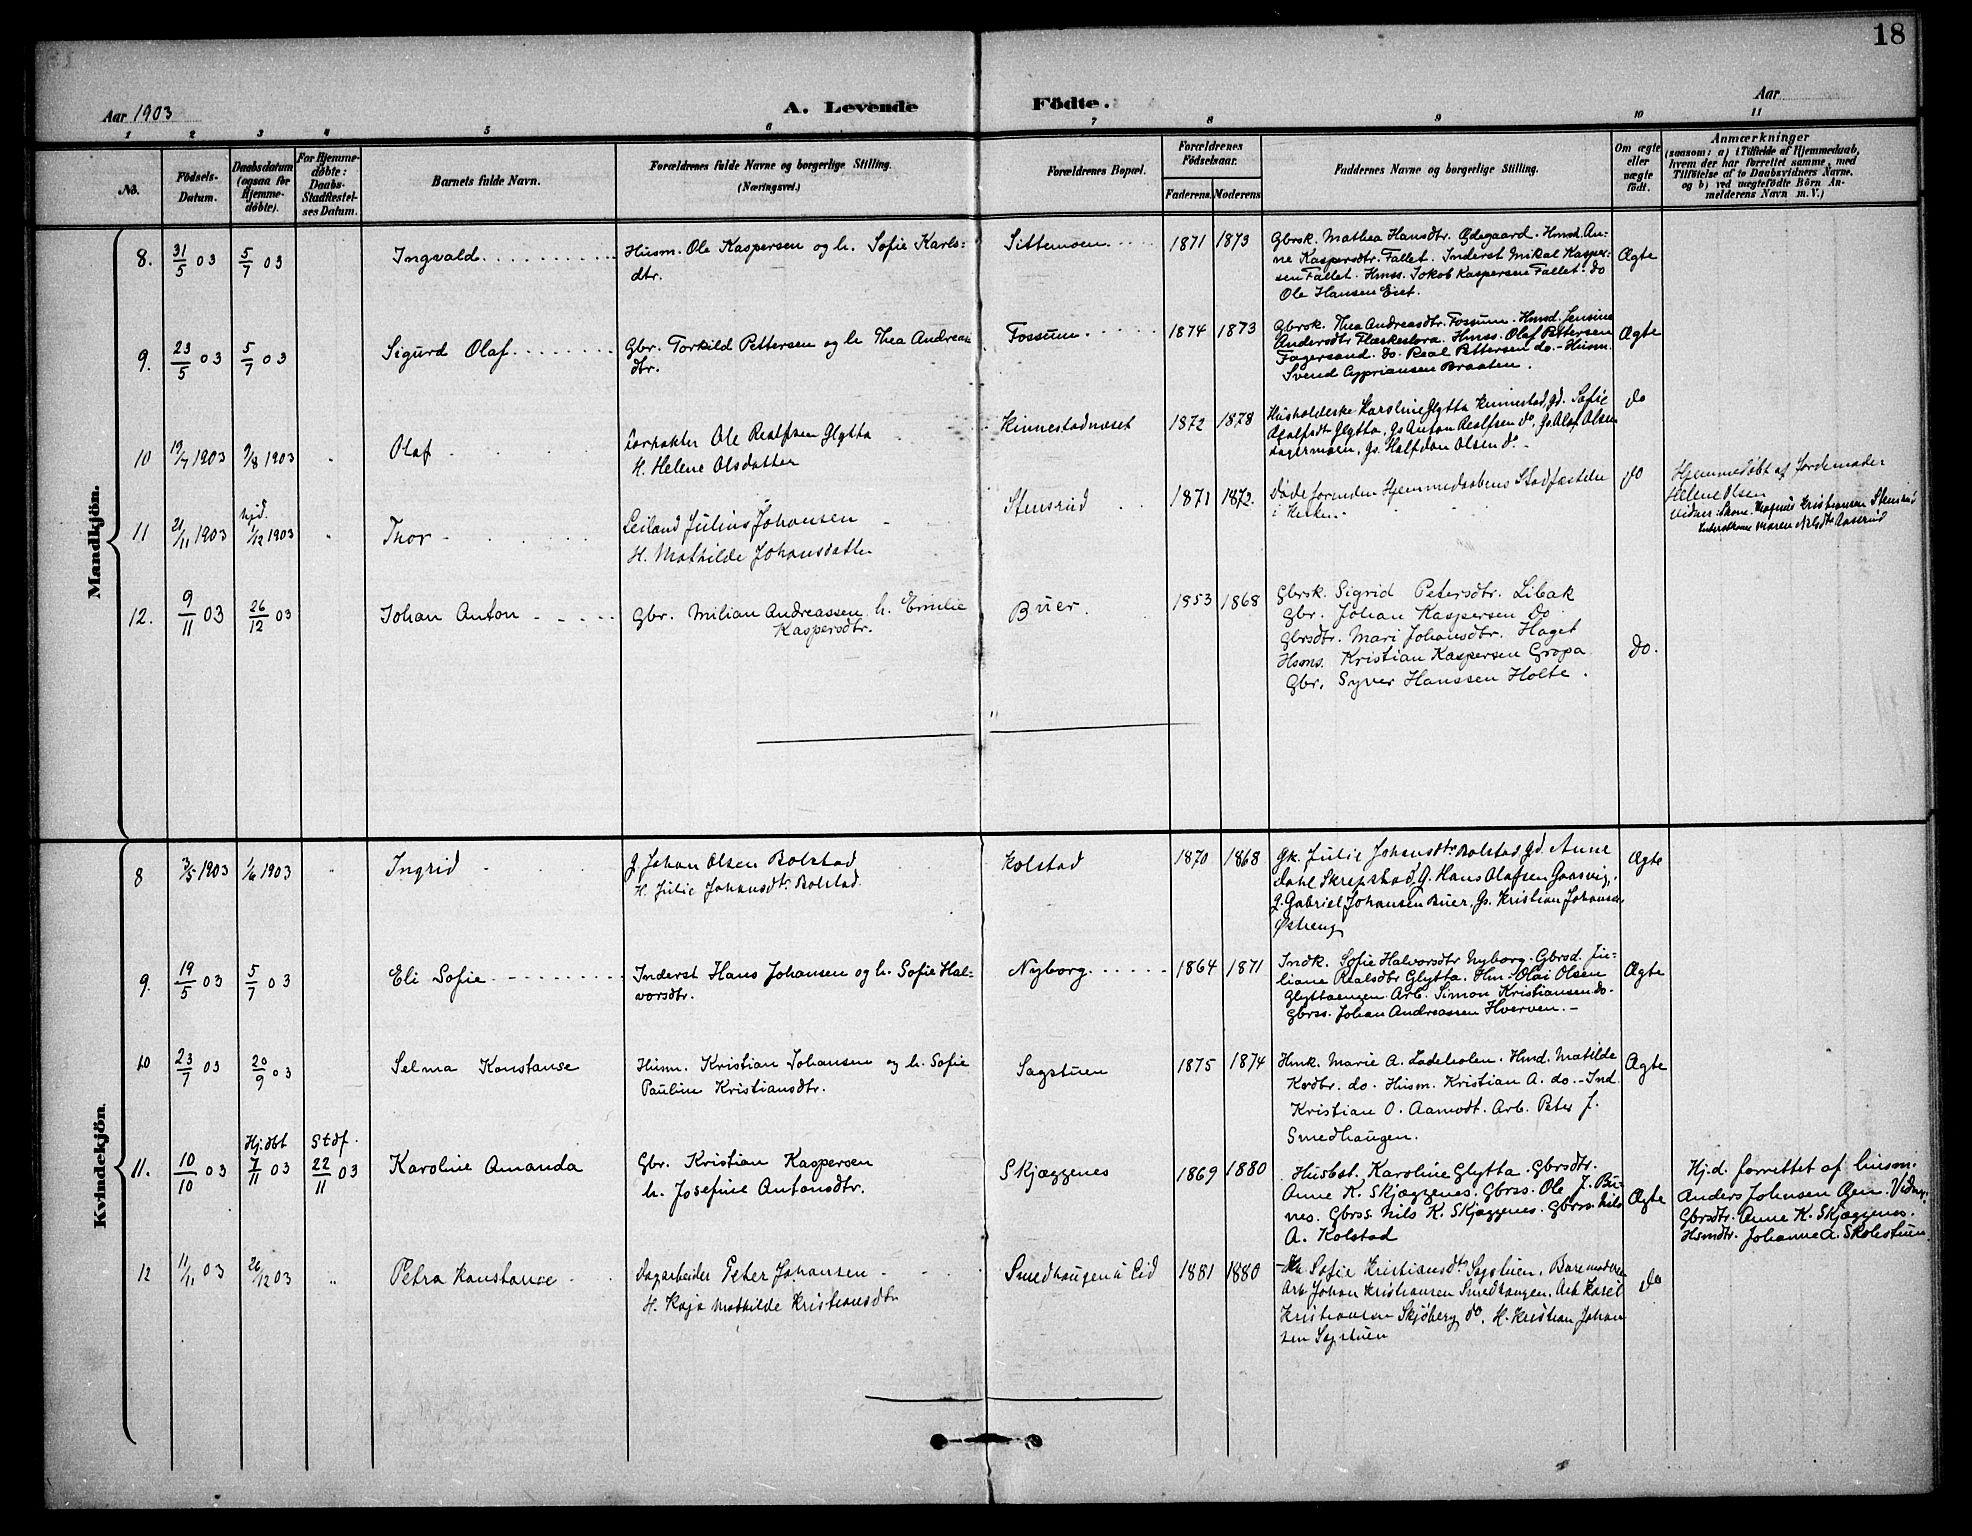 SAO, Høland prestekontor Kirkebøker, F/Fc/L0003: Ministerialbok nr. III 3, 1897-1911, s. 18